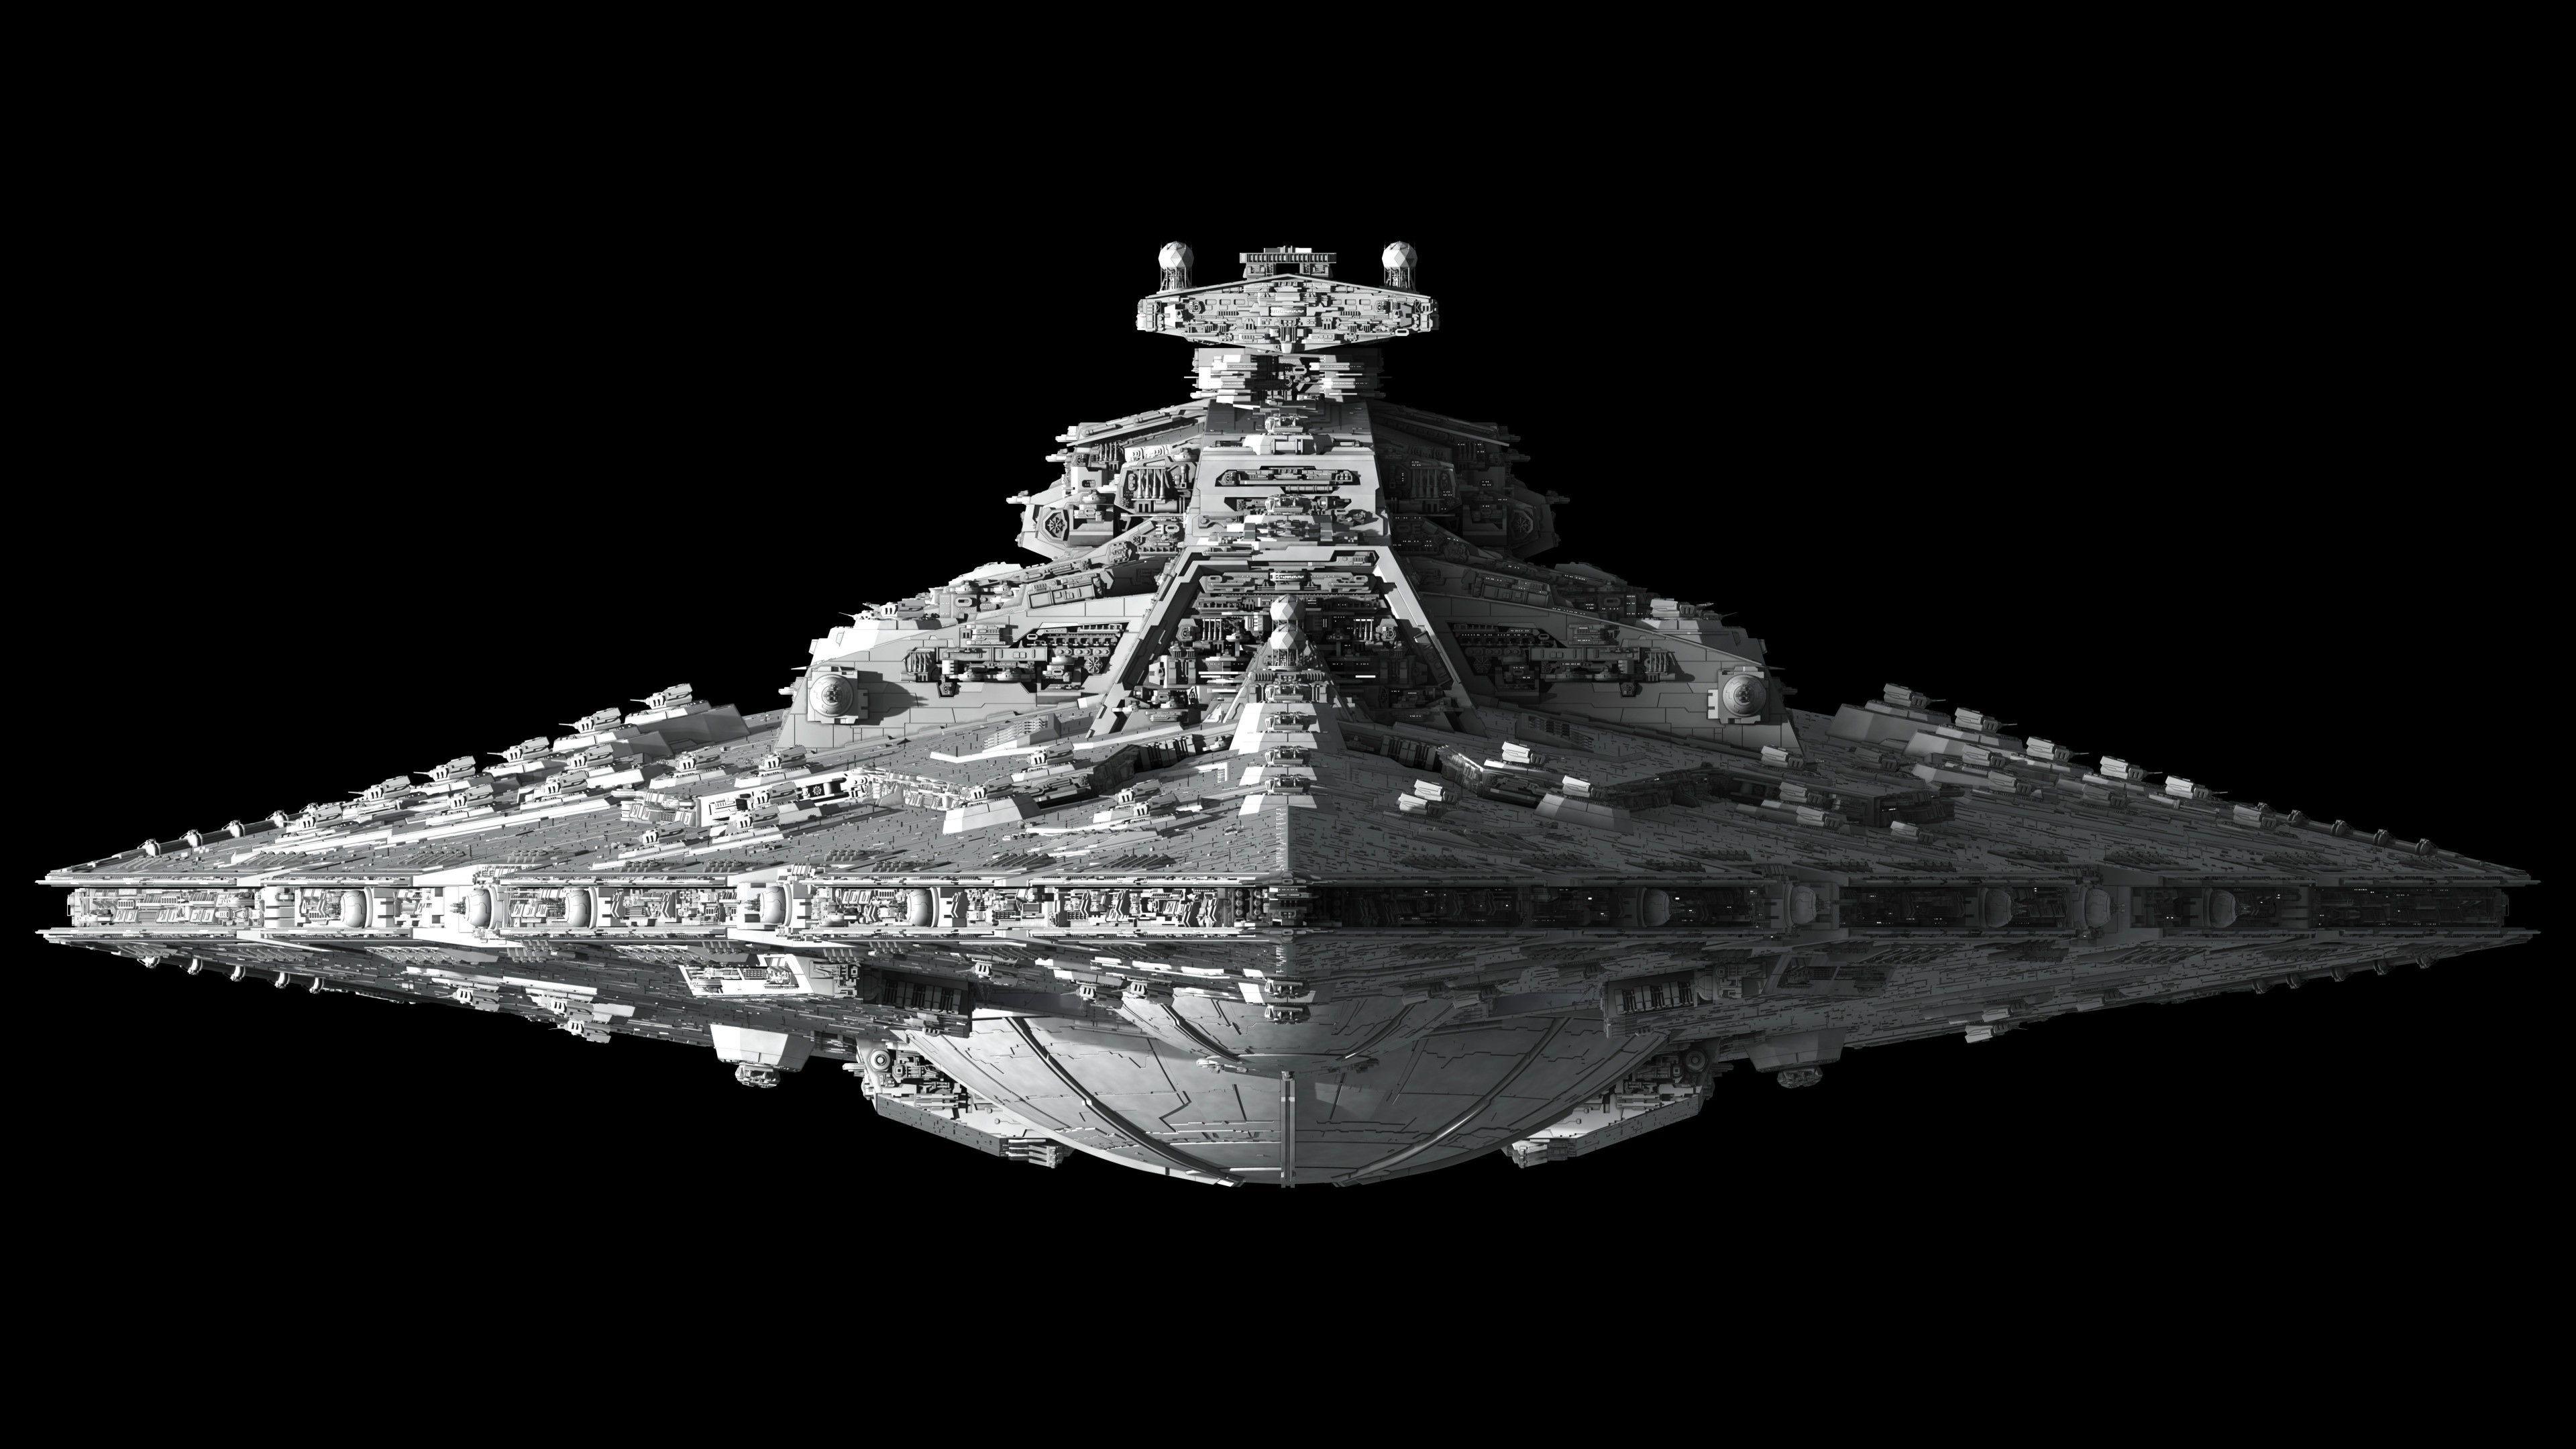 HiRes Star Wars Imperial Star Destroyer Star destroyer